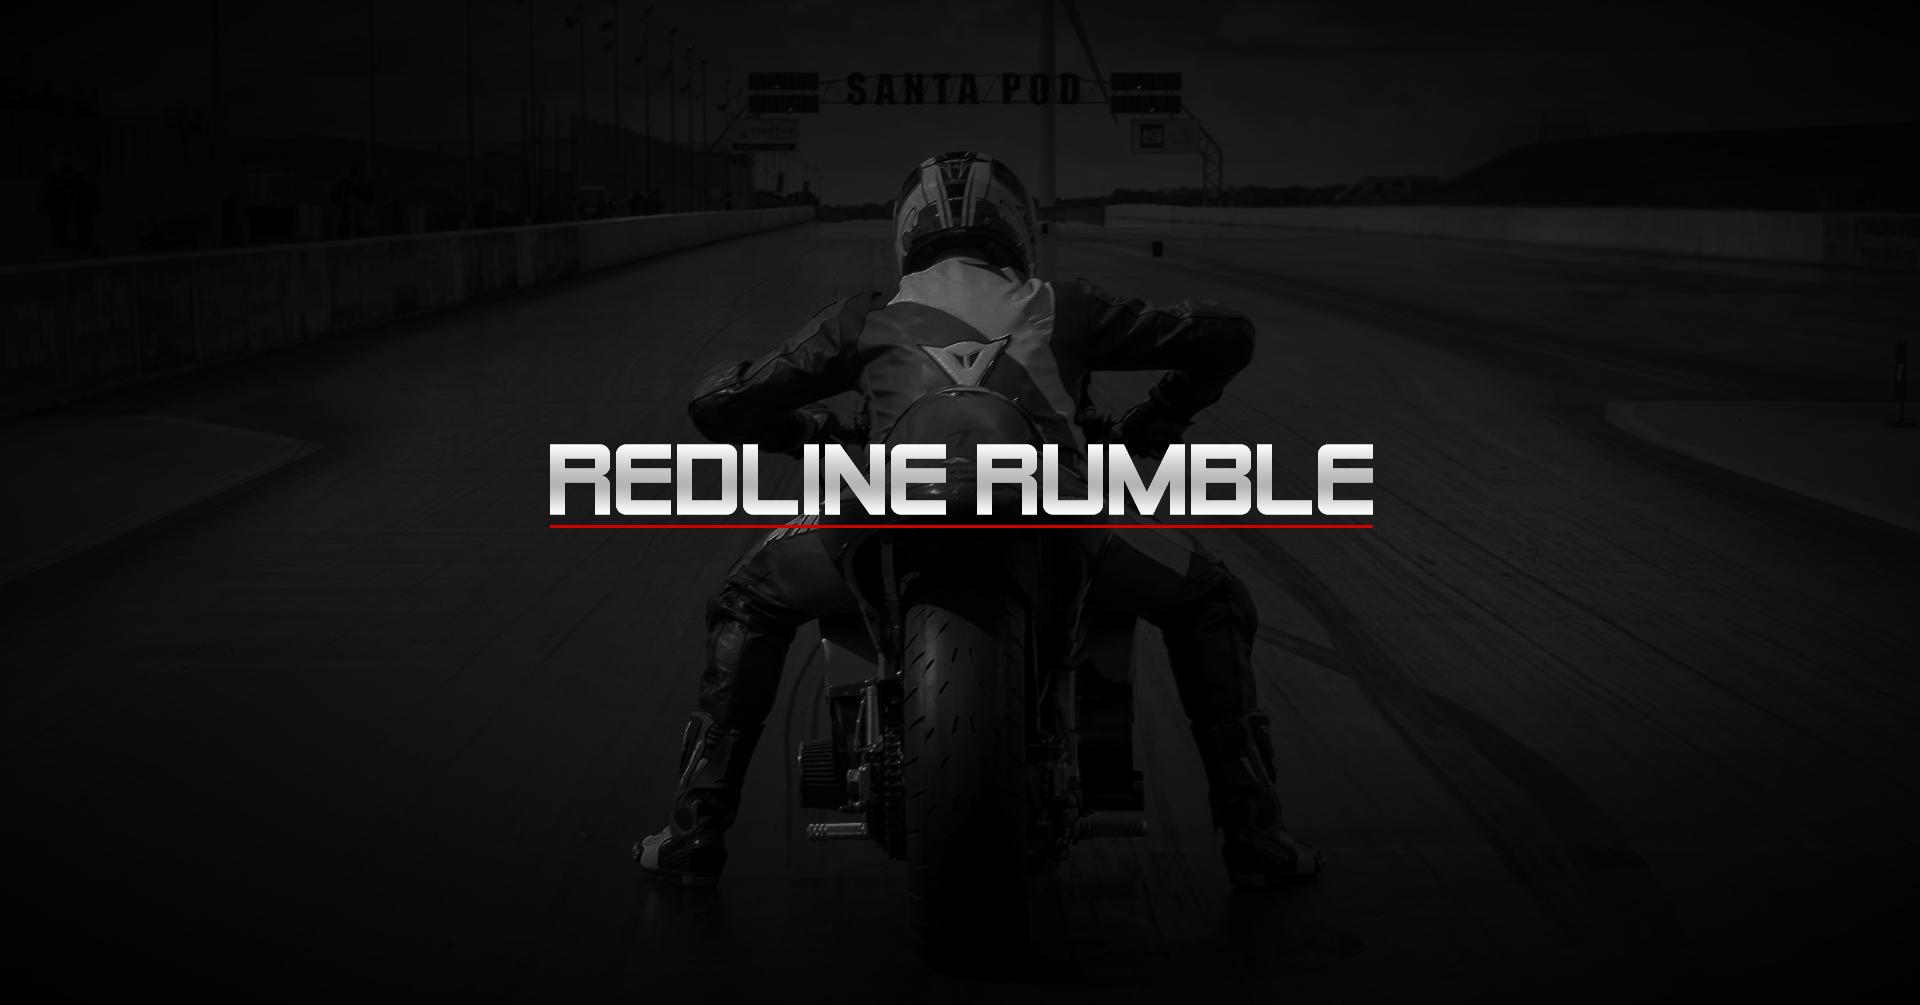 santa pod raceway redline rumble